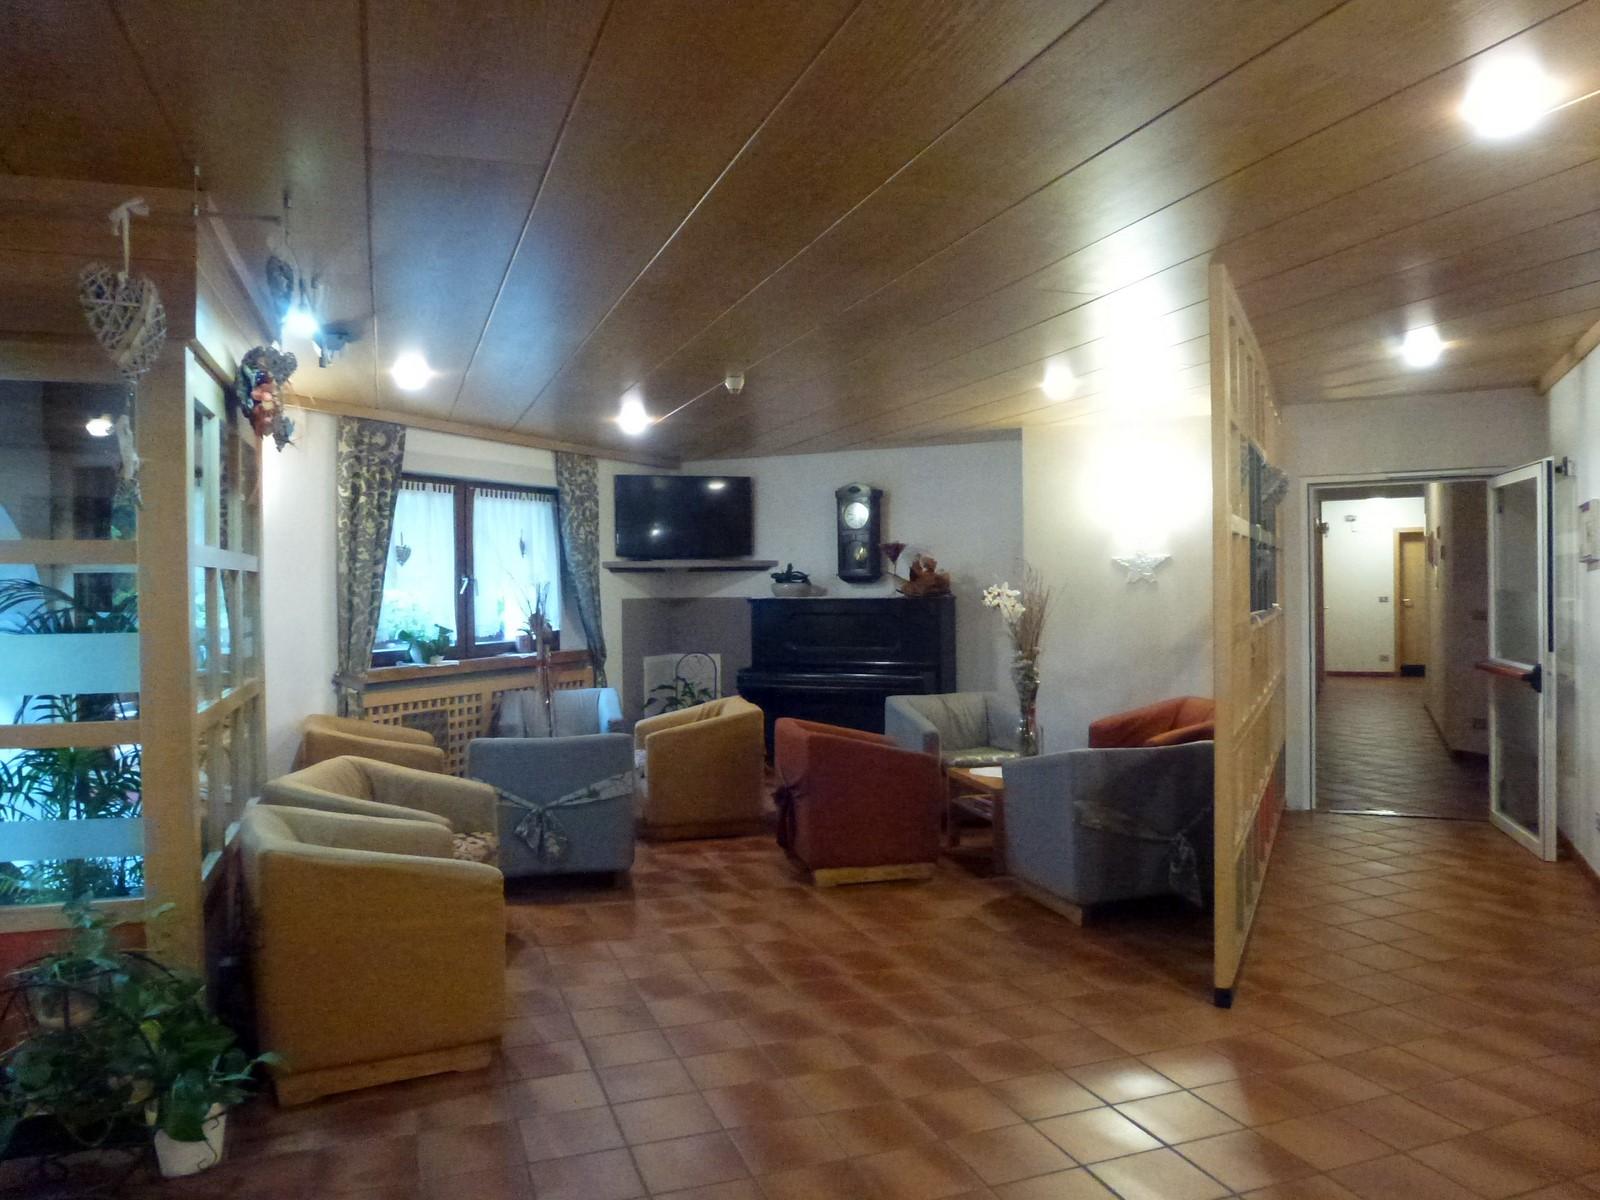 Alpin Haus Casa Alpina Selva Val Gardena